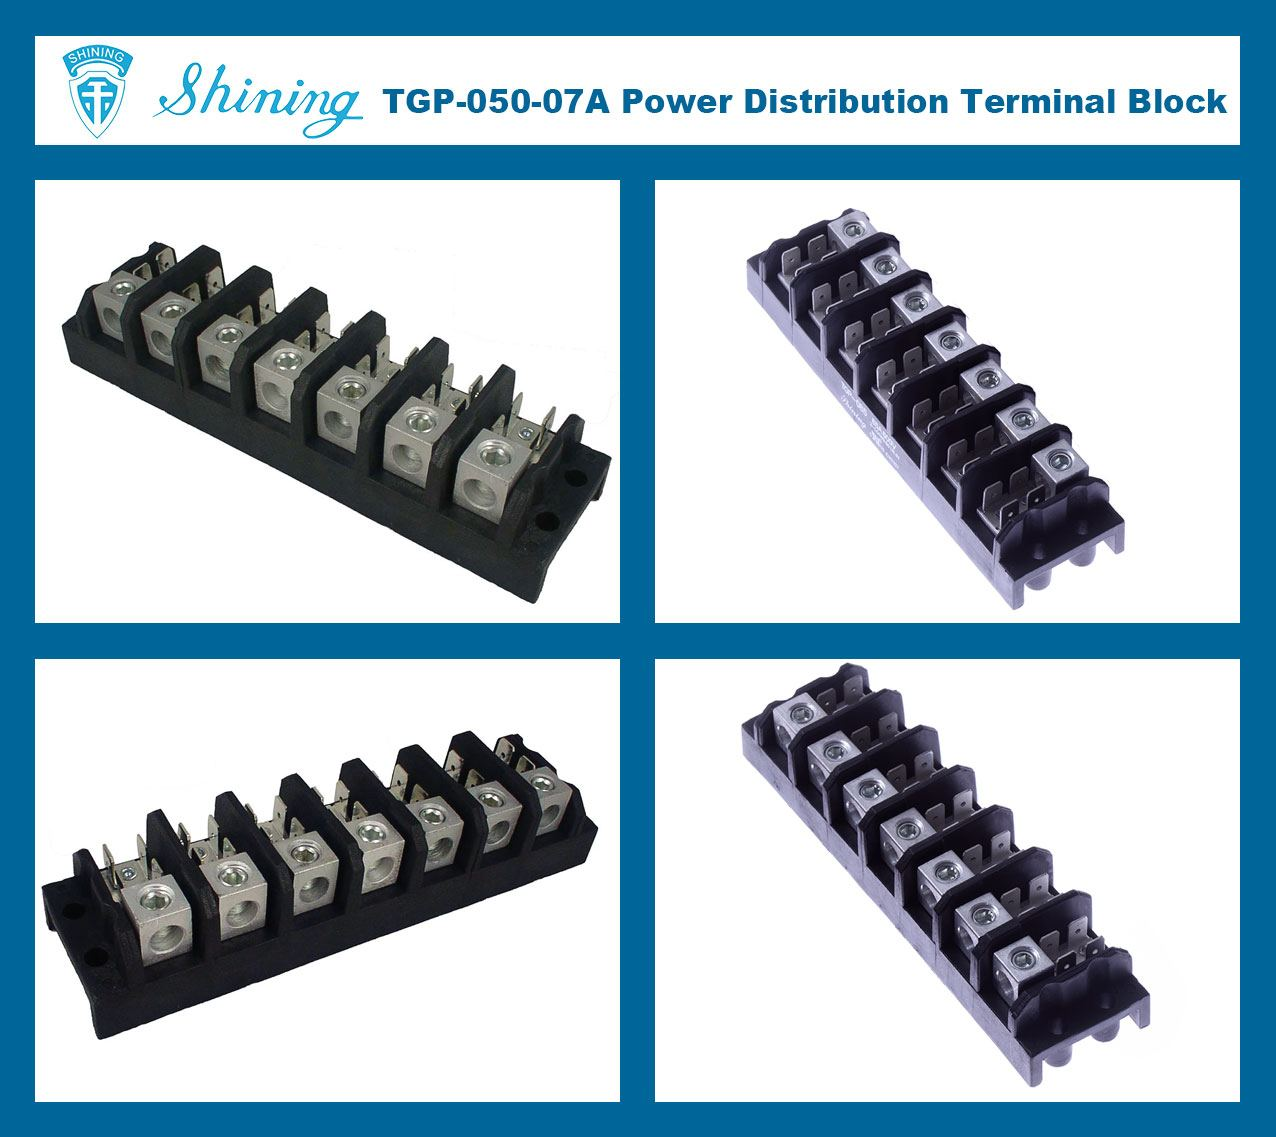 TGP-050-07A 600V 50A 7 Pole Electrical Power Terminal Block